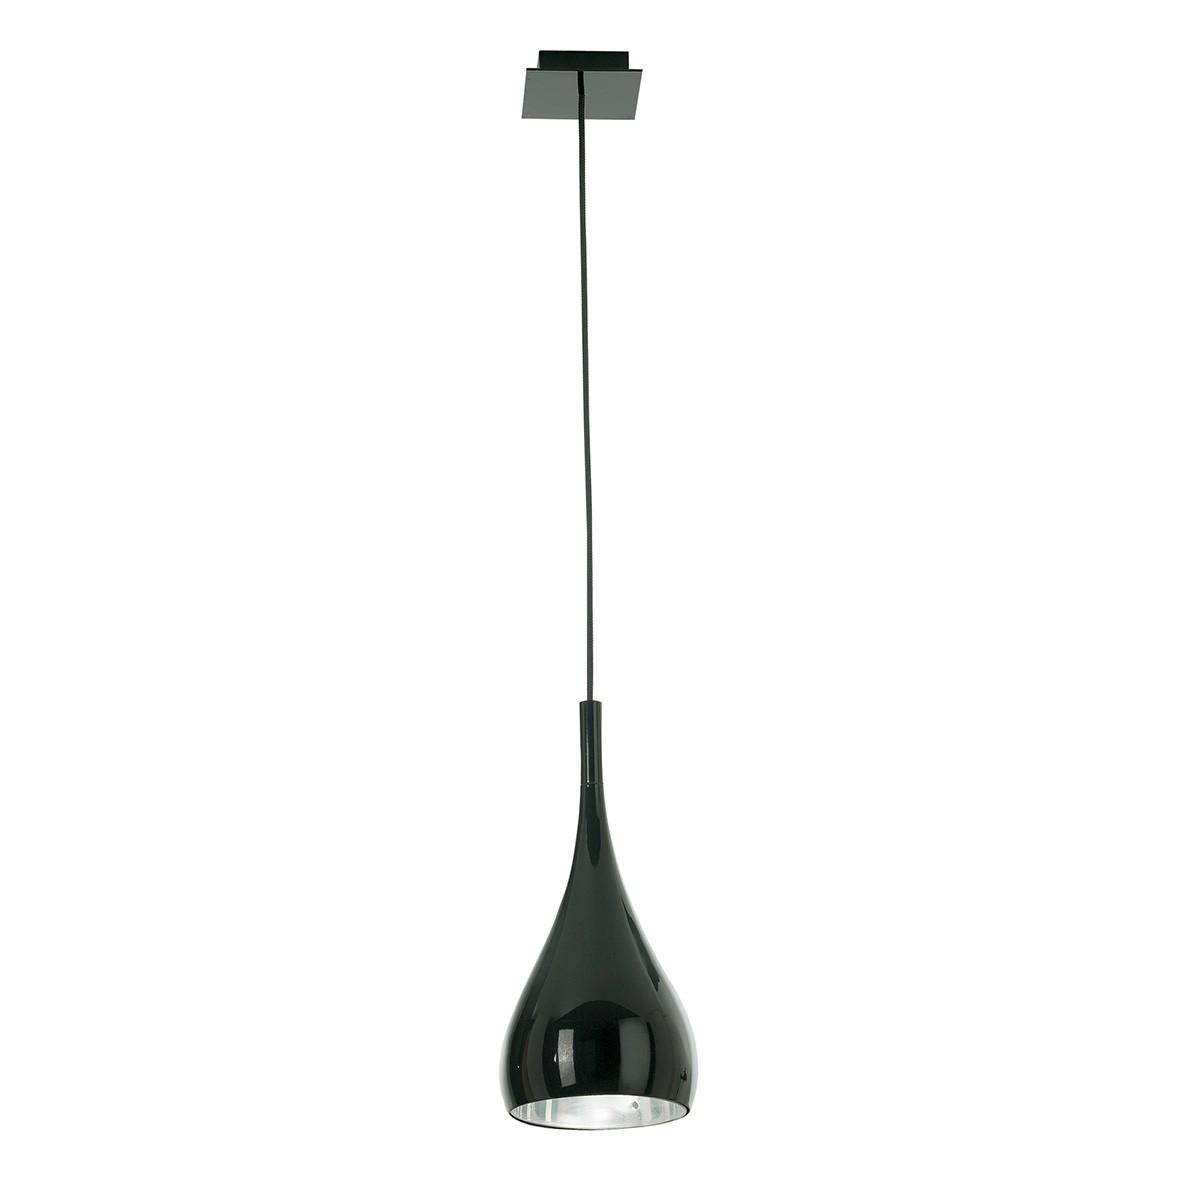 Fabbian Bijou Pendelleuchte, schwarz,Ø: 16 cm